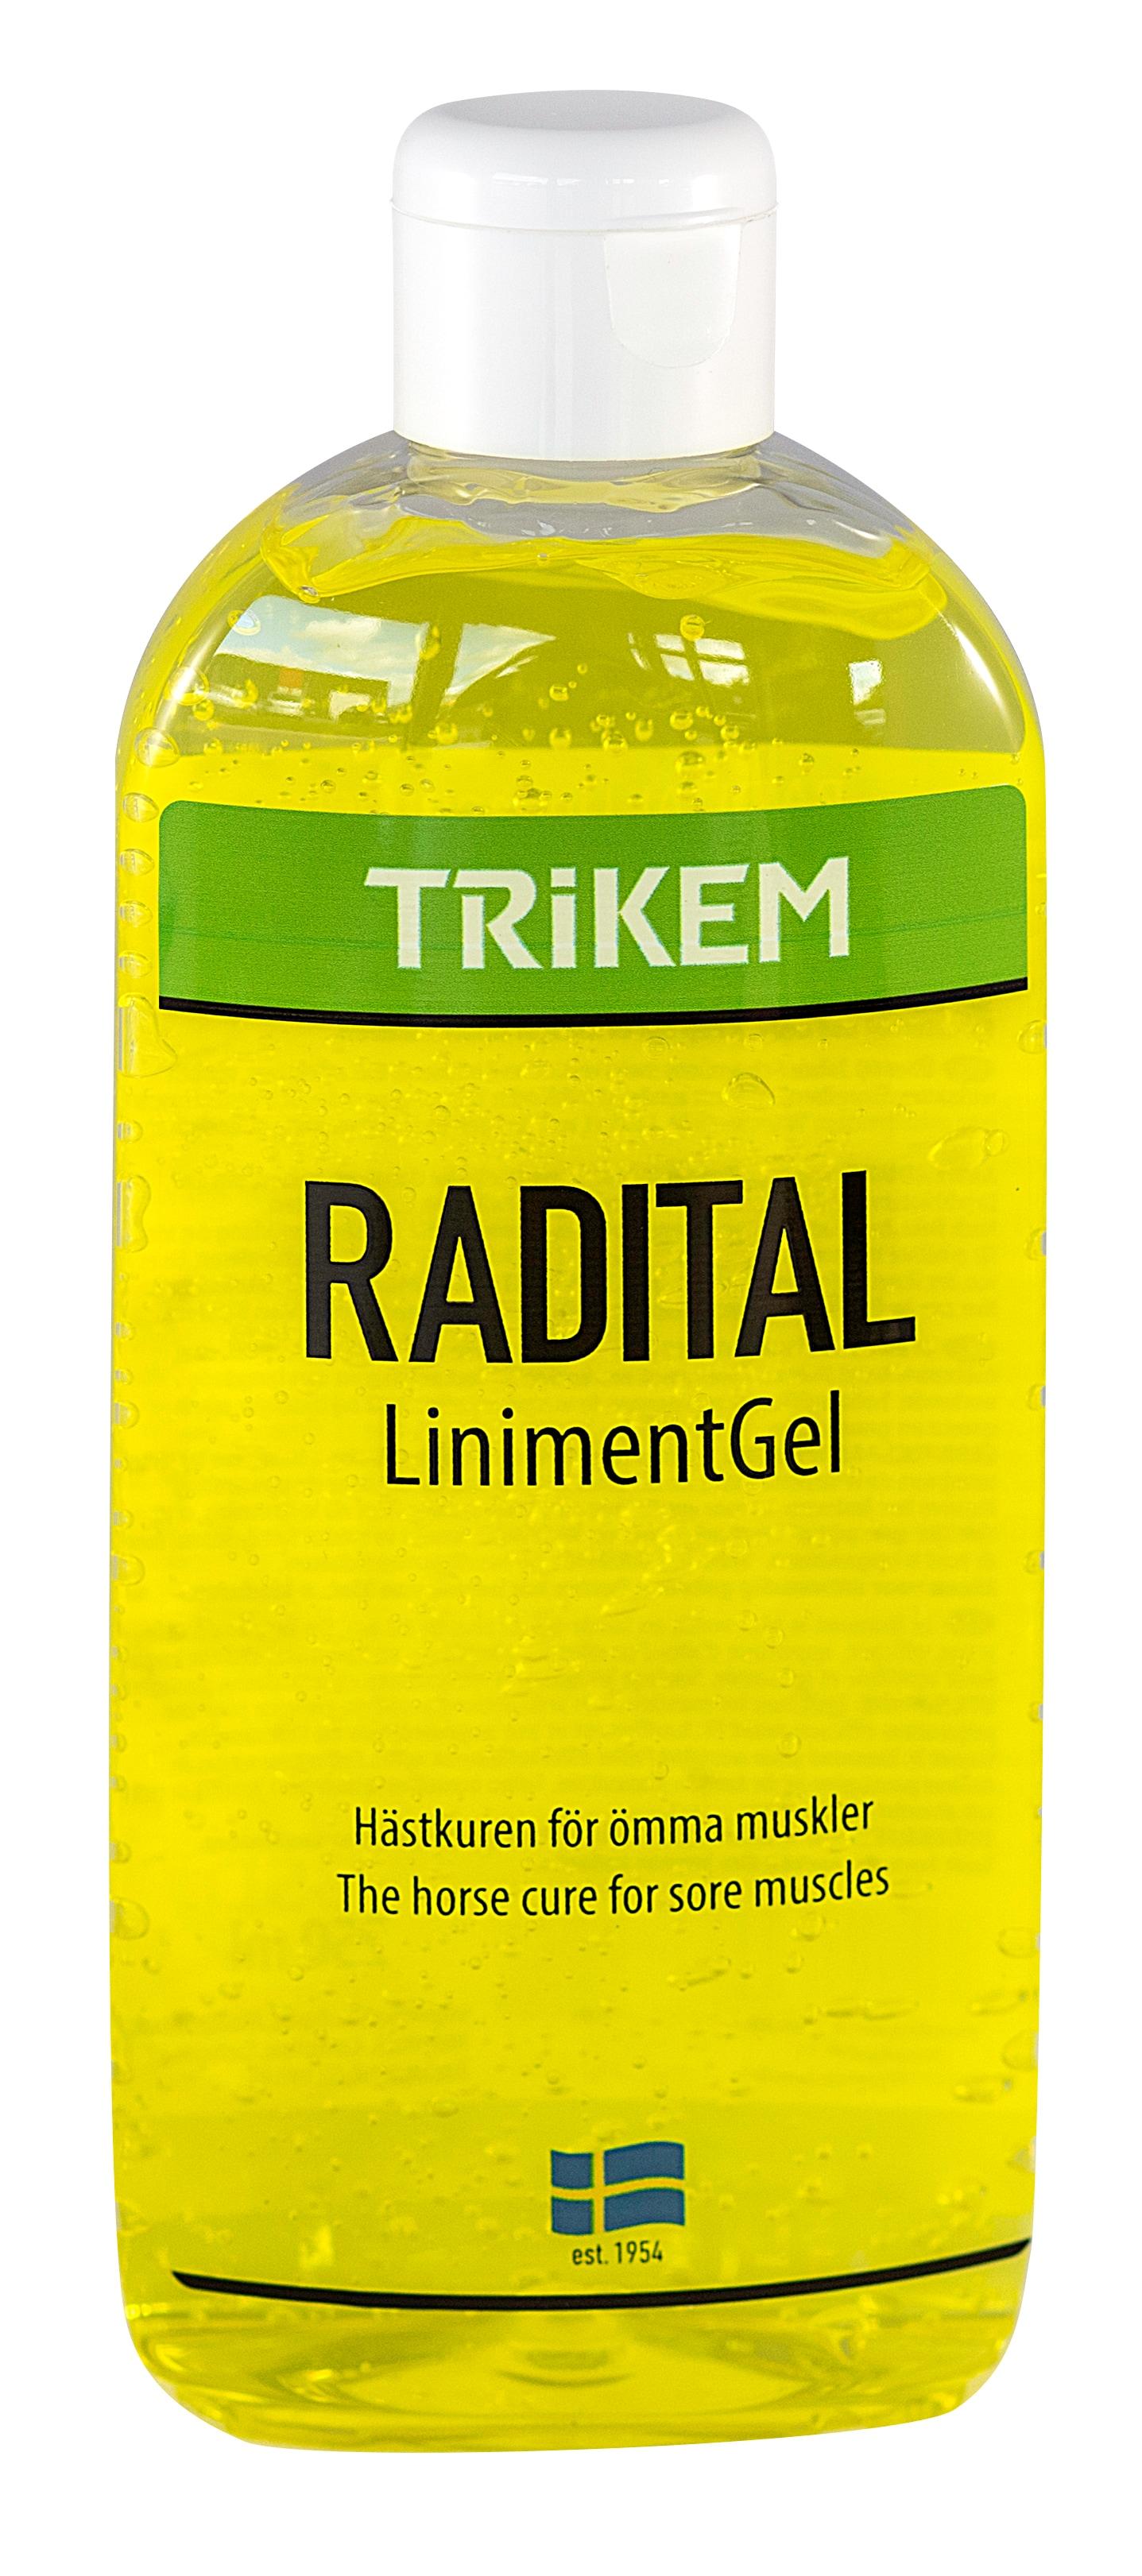 radital-linement-gel-trikem